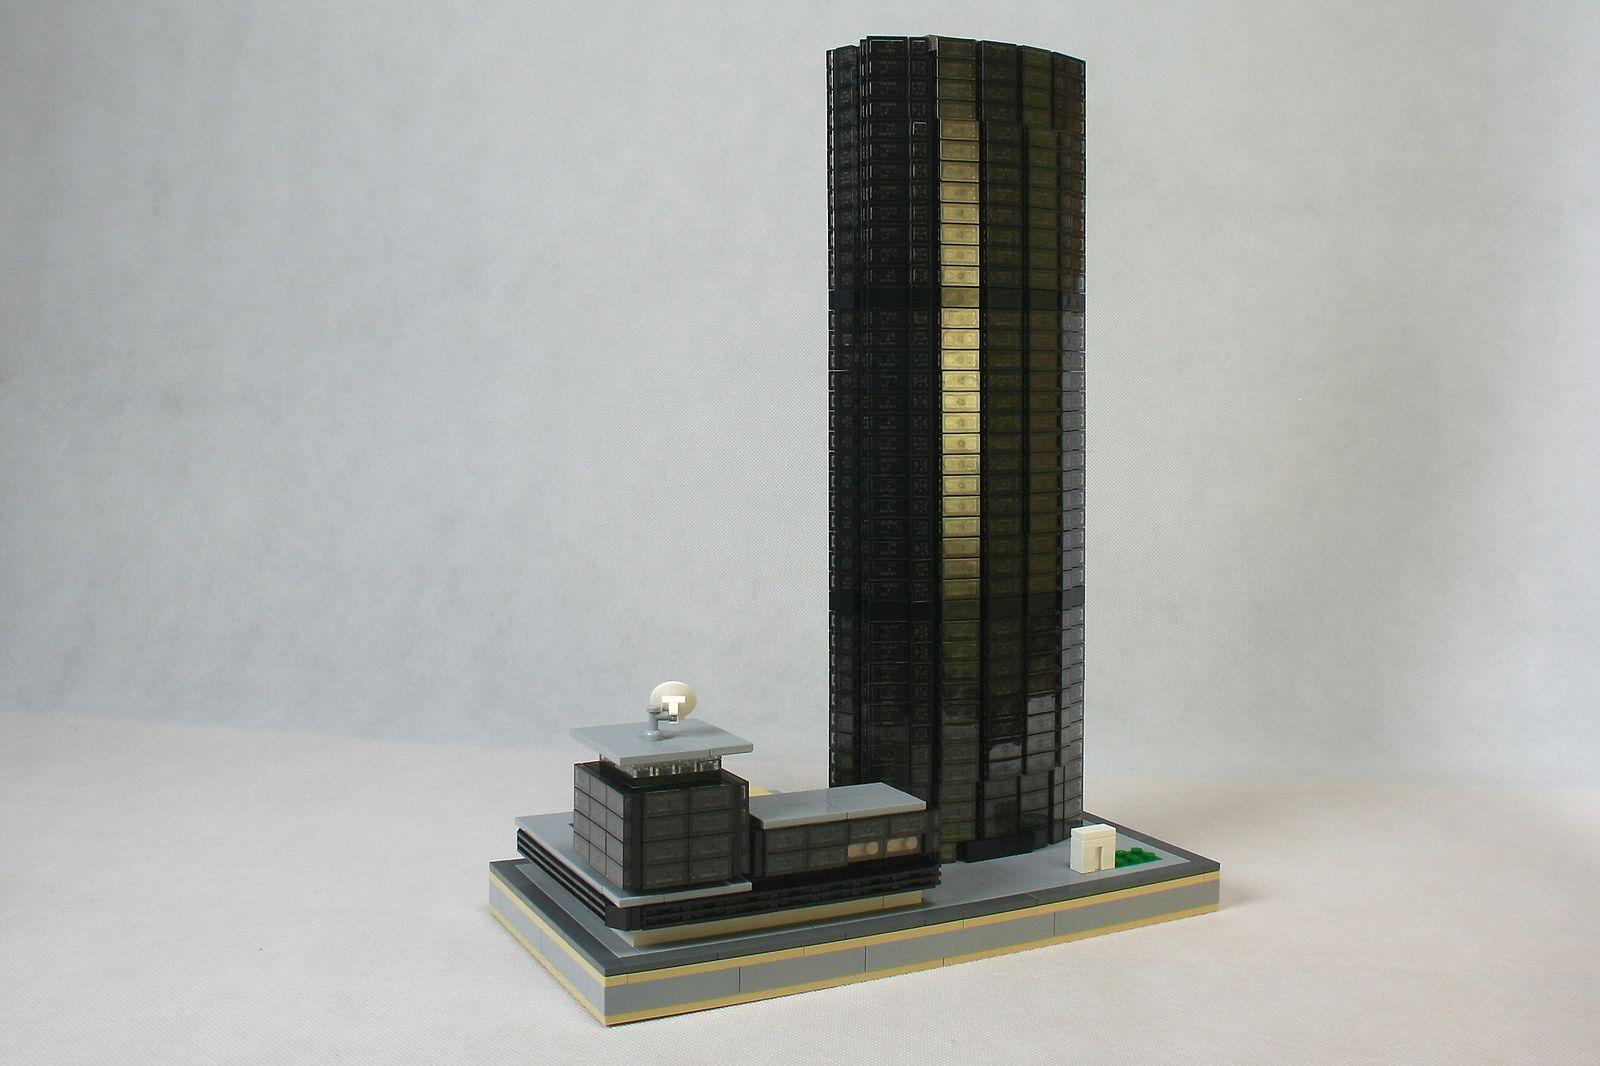 martin s kora modeled tour montparnasse paris 39 third tallest building at 1 650 scale the. Black Bedroom Furniture Sets. Home Design Ideas